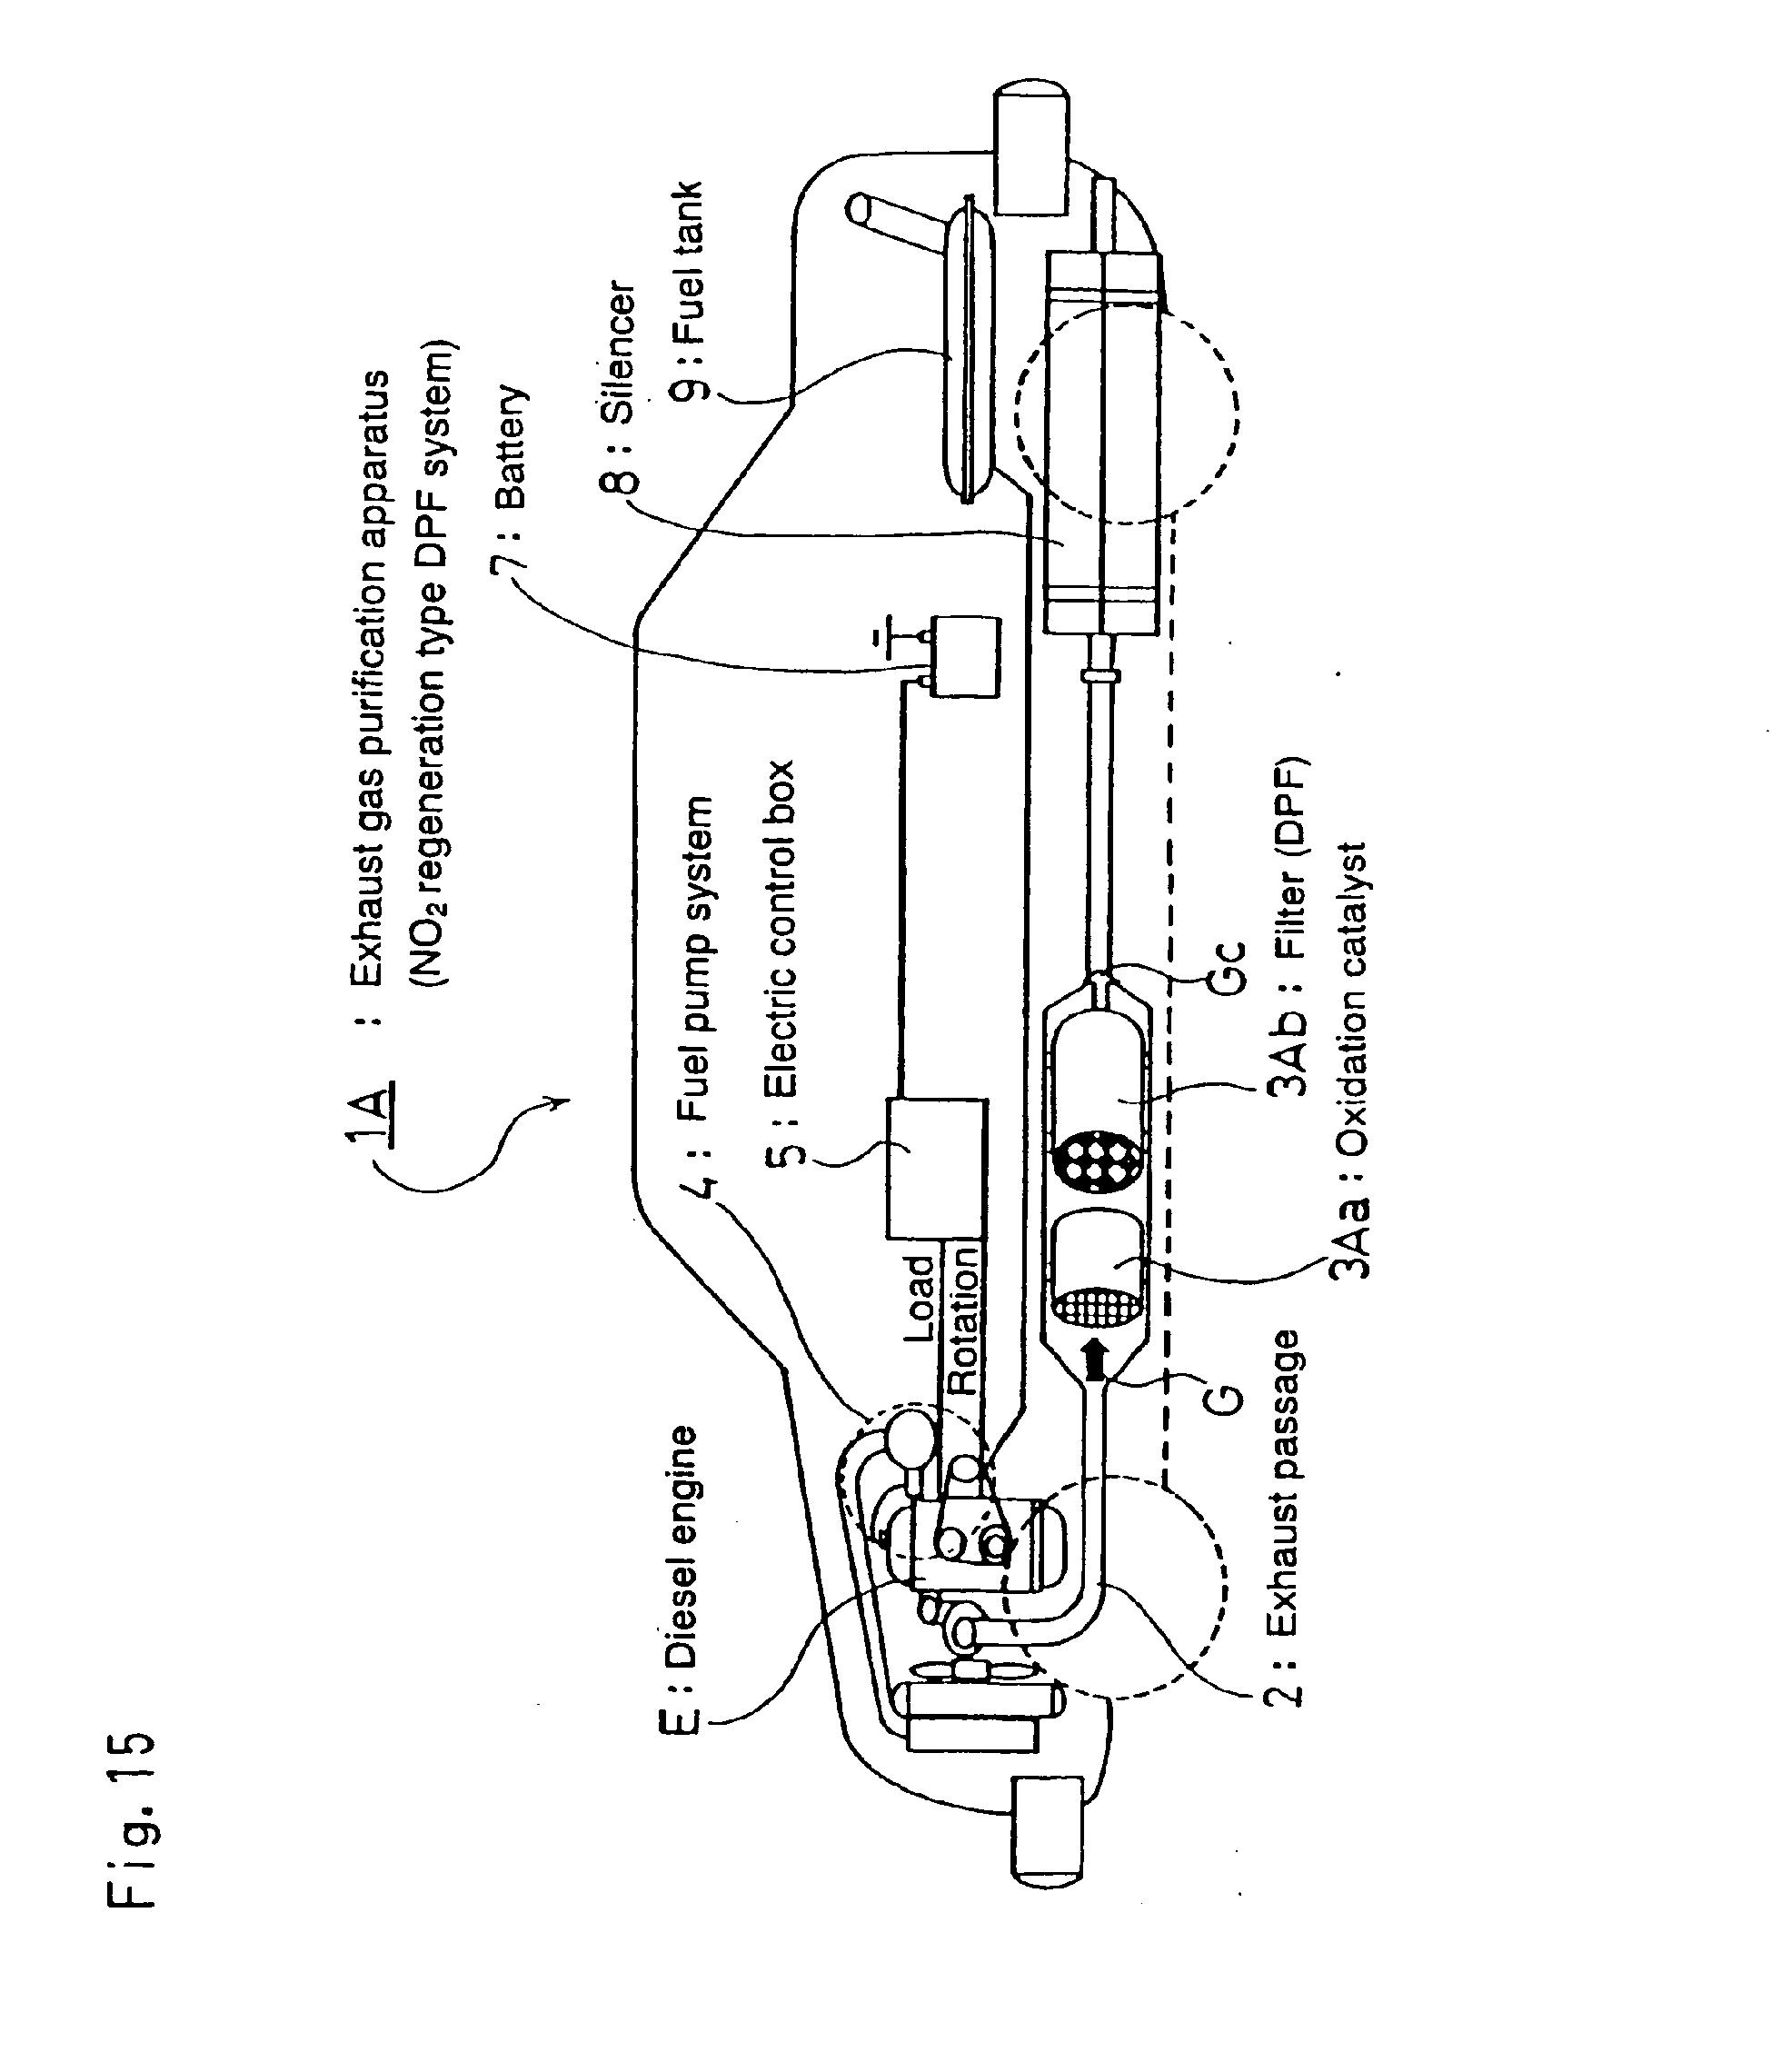 patent ep1363009b1 kraftstoffinjektionssteuerverfahren. Black Bedroom Furniture Sets. Home Design Ideas